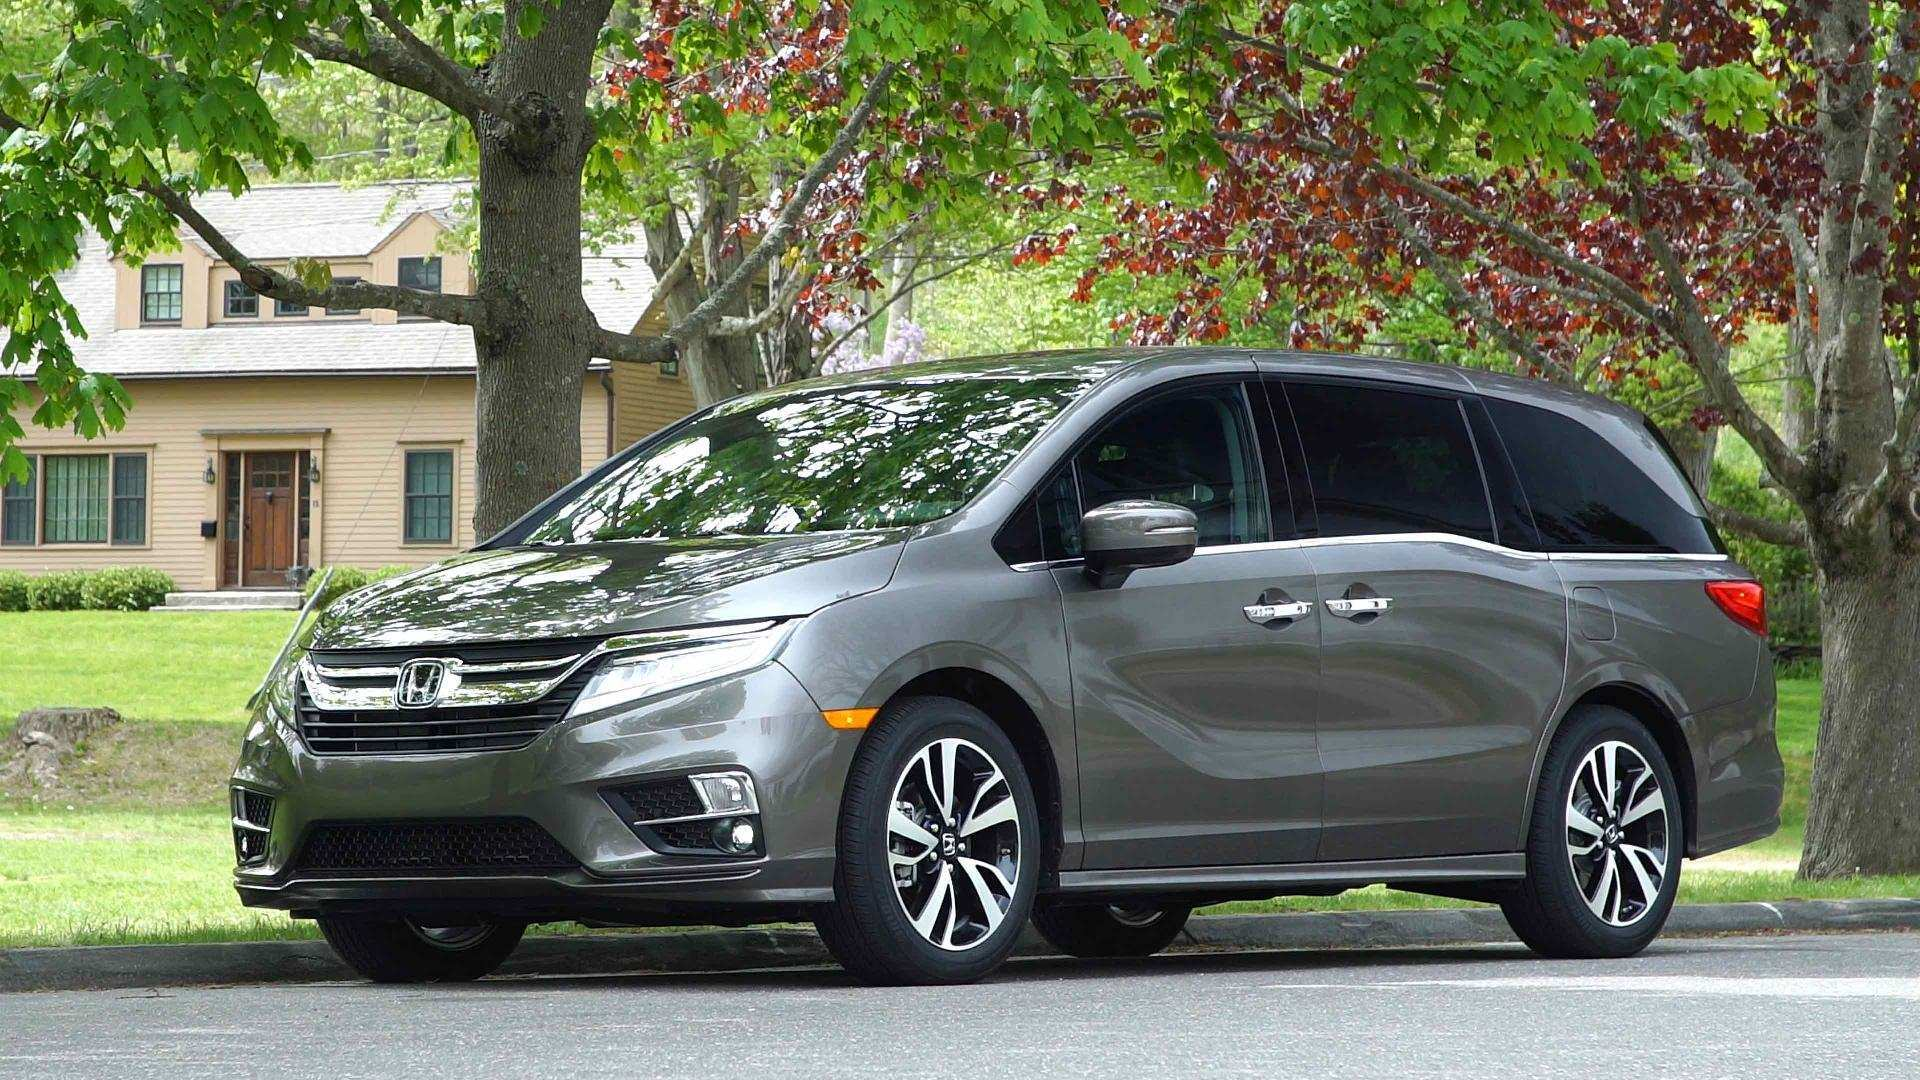 42 The Honda Odyssey 2020 Awd Speed Test for Honda Odyssey 2020 Awd